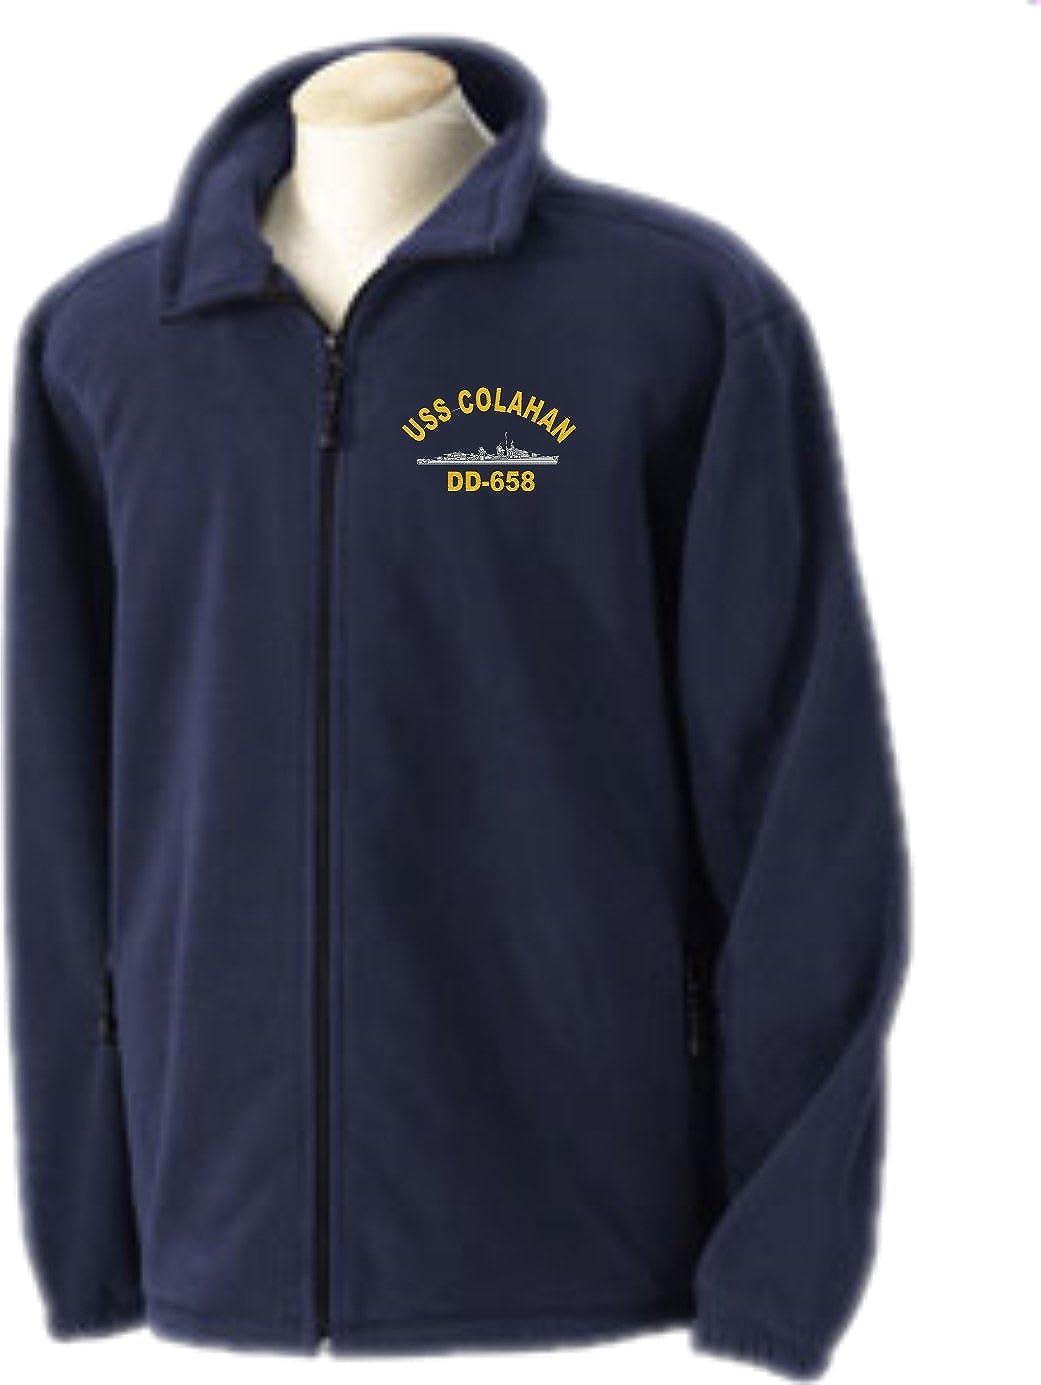 Custom Military Apparel USS Colahan DD-658 Embroidered Fleece Jacket Sizes Small-4X